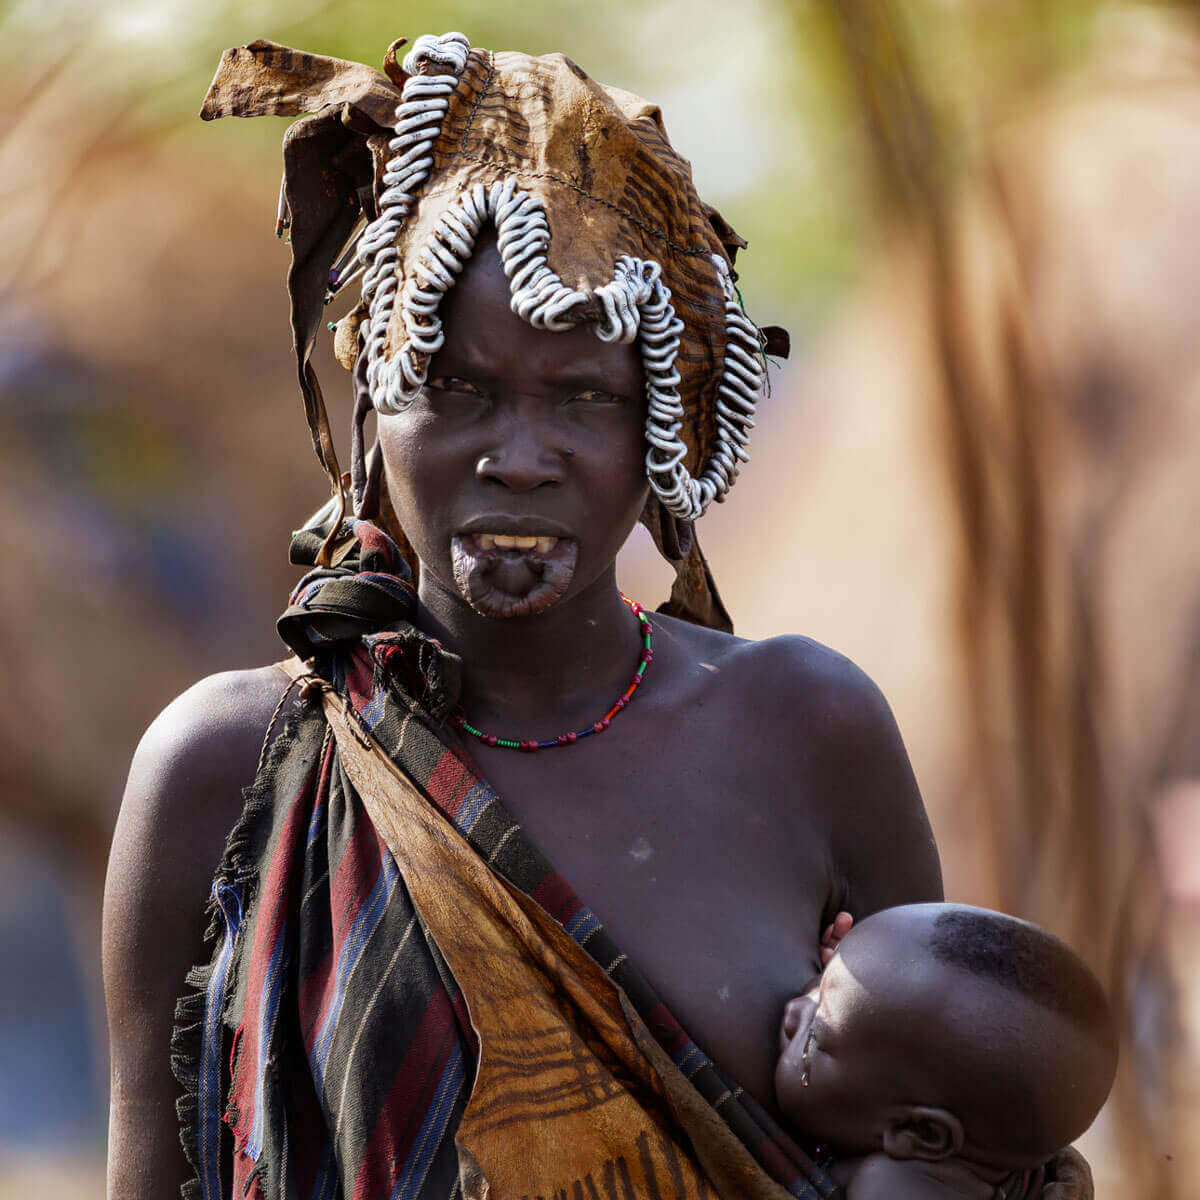 Ethiopia_mursi_tribe_surma_suri_lipplate_kids_baby_omo_valley_traveling_thebesttime_visiting_village_adventuresinethiopia